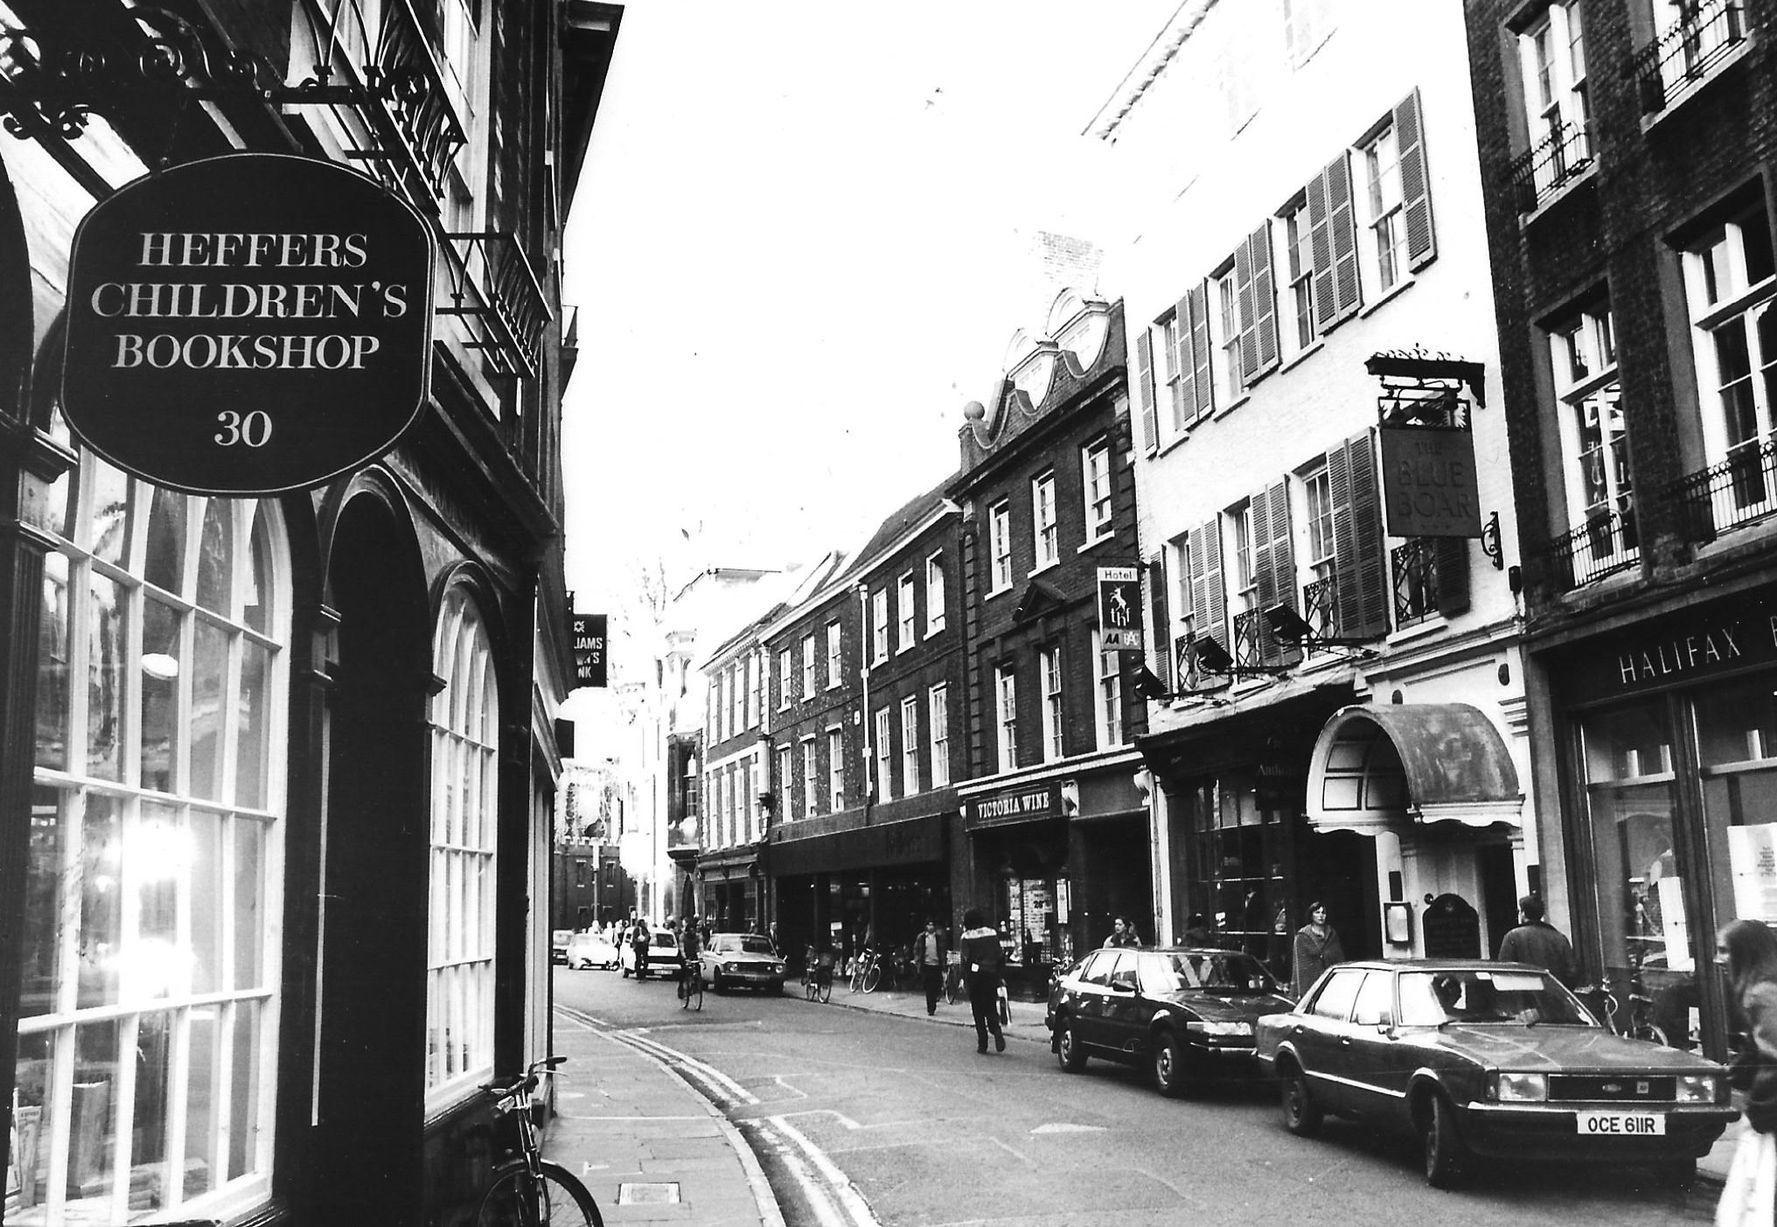 Heffers is still in Trinity Street, Cambridge, but their